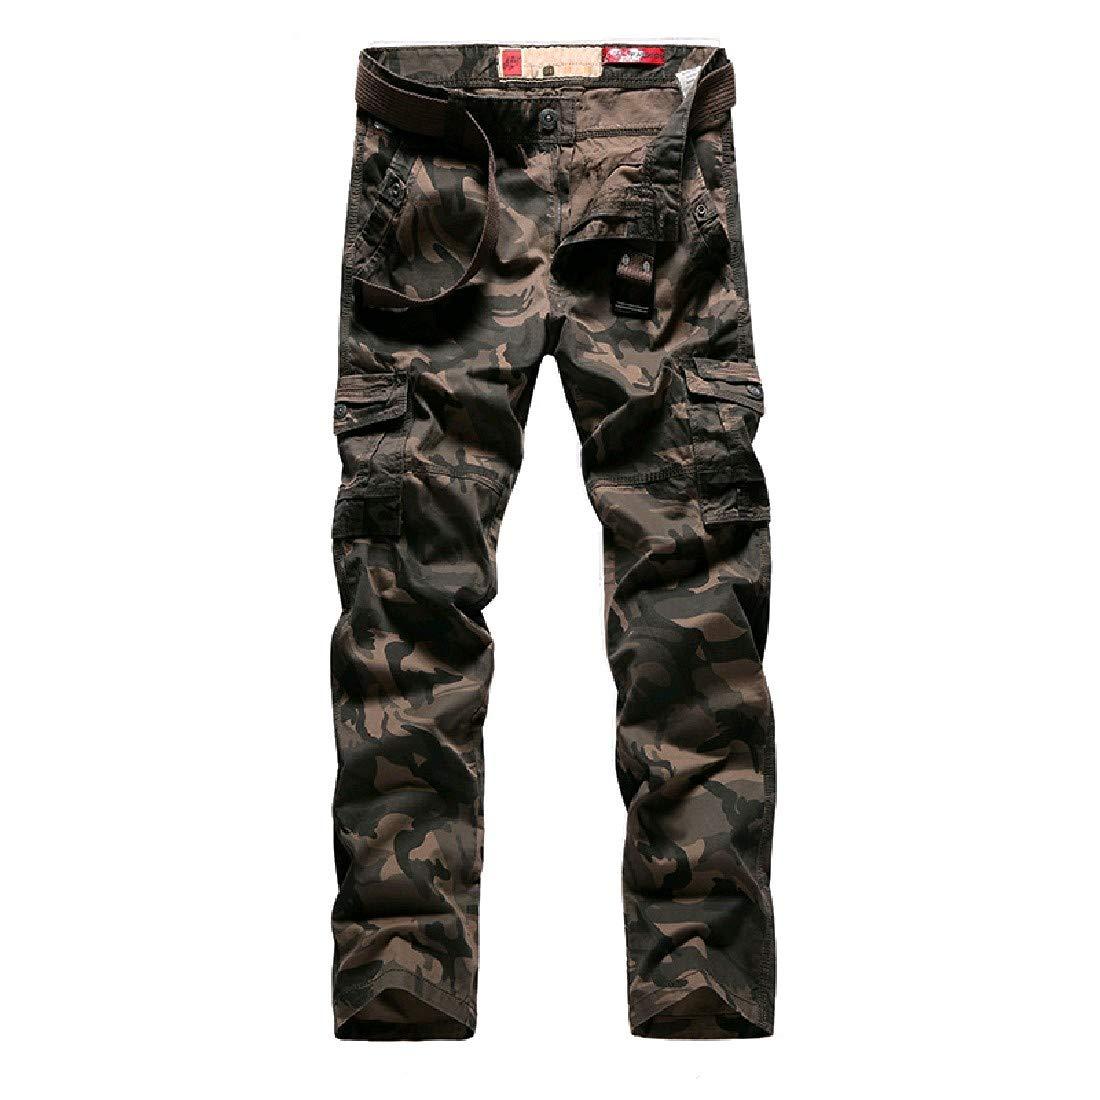 Khaki Doanpa Mens Oversize Oversize Oversize Pocket Trim Camouflage Straight Work Cargo Pants b24cb2